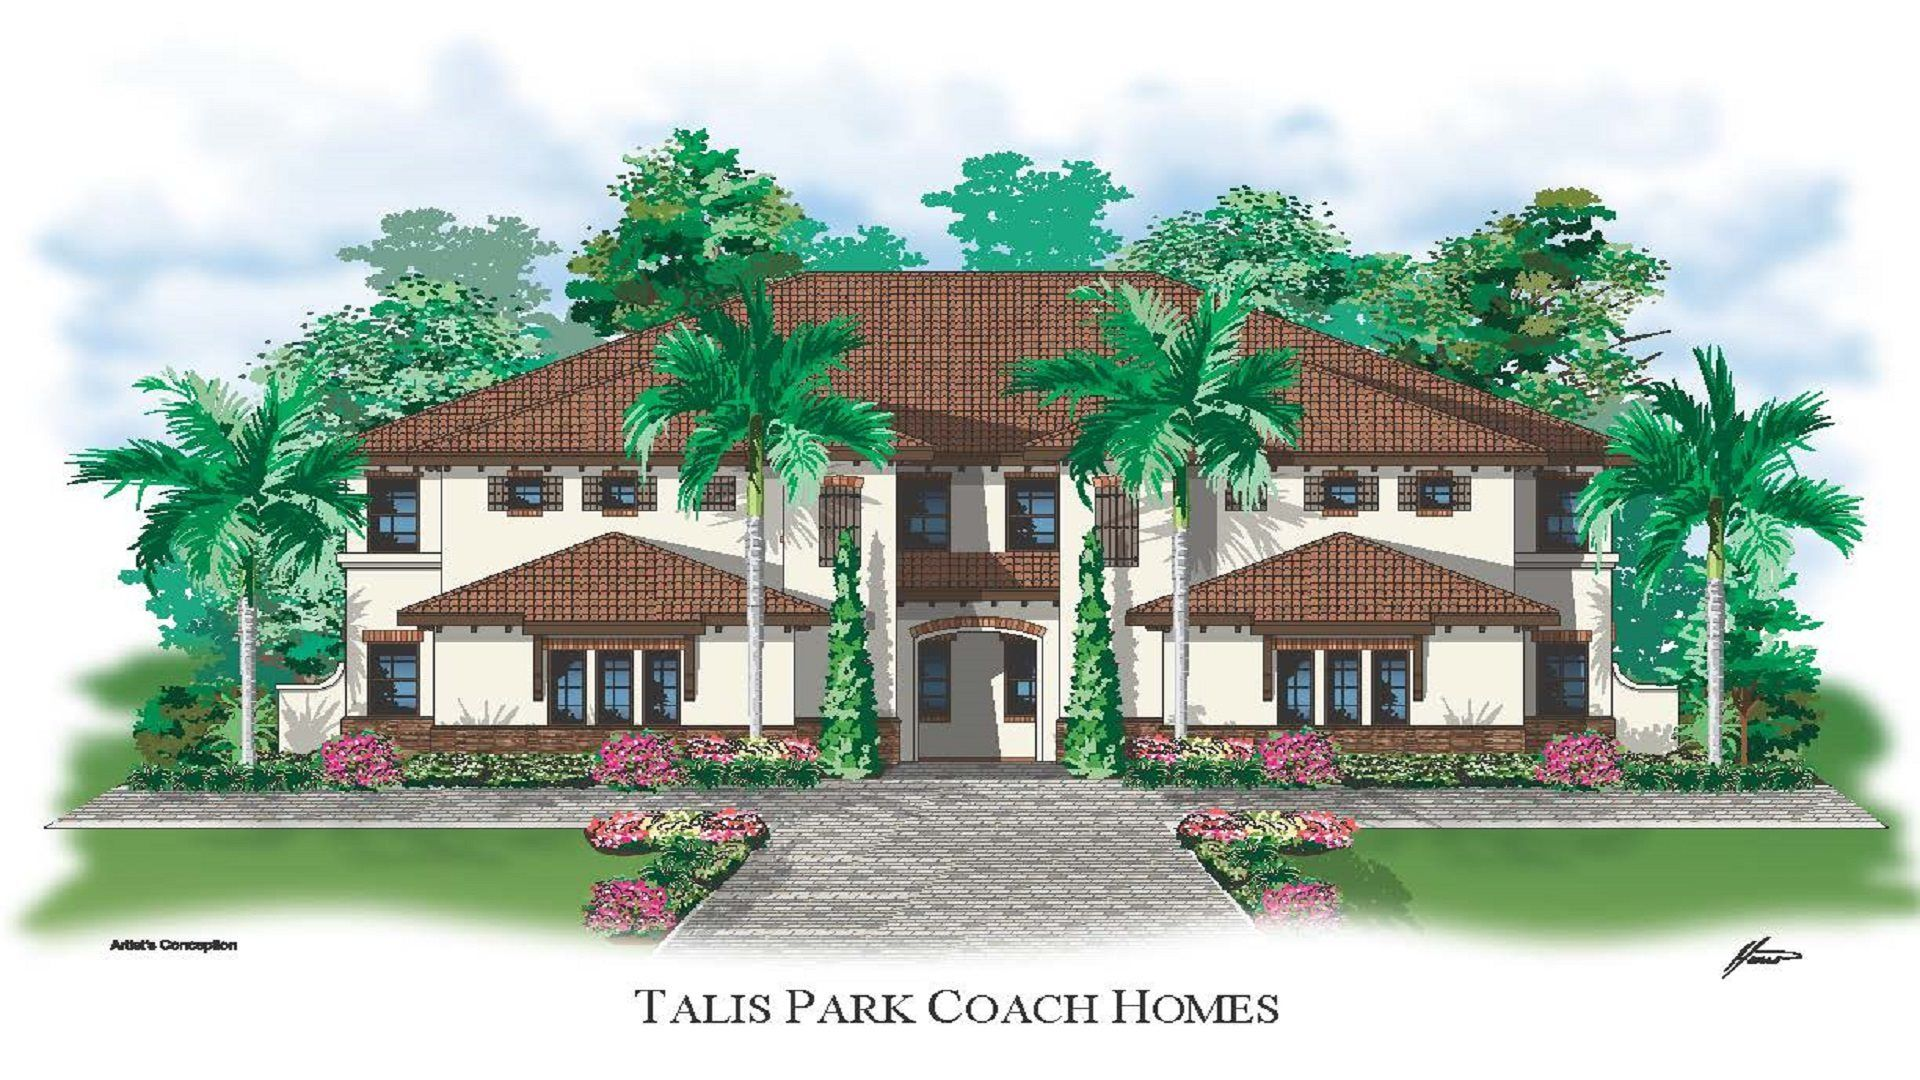 Talis Park Coach Homes